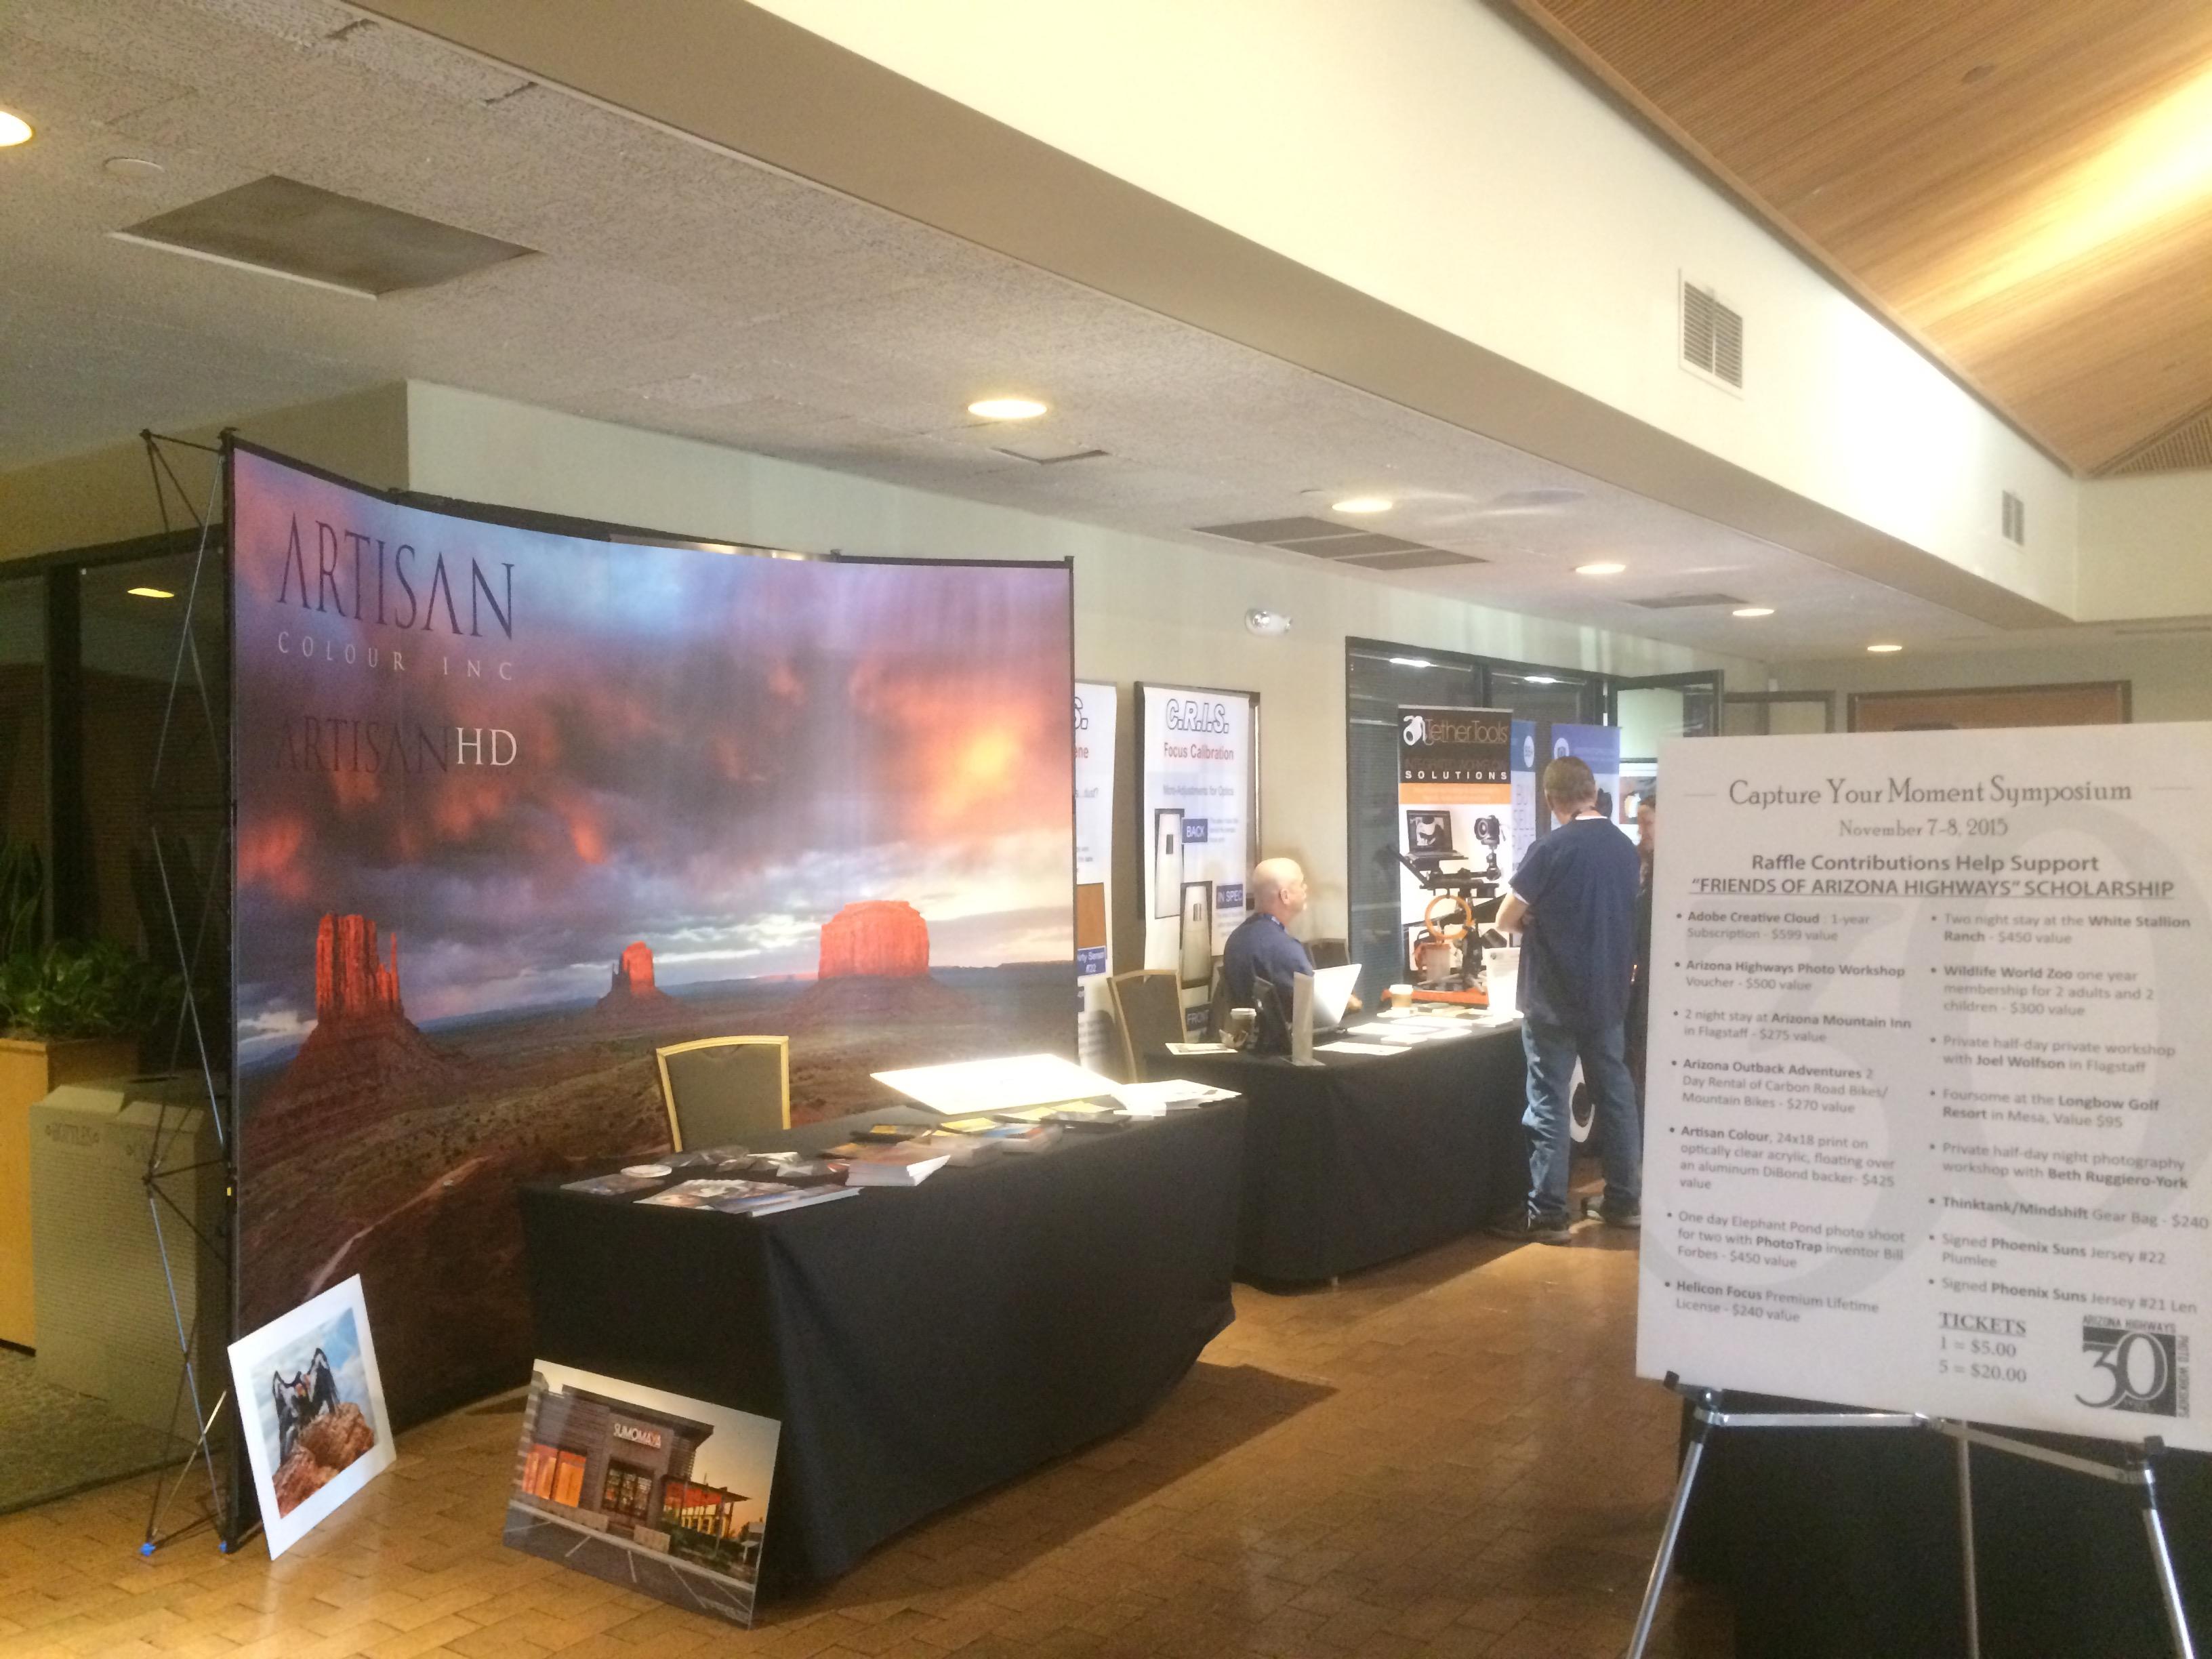 ArtisanHD Table at Arizona Highways Photo Symposium